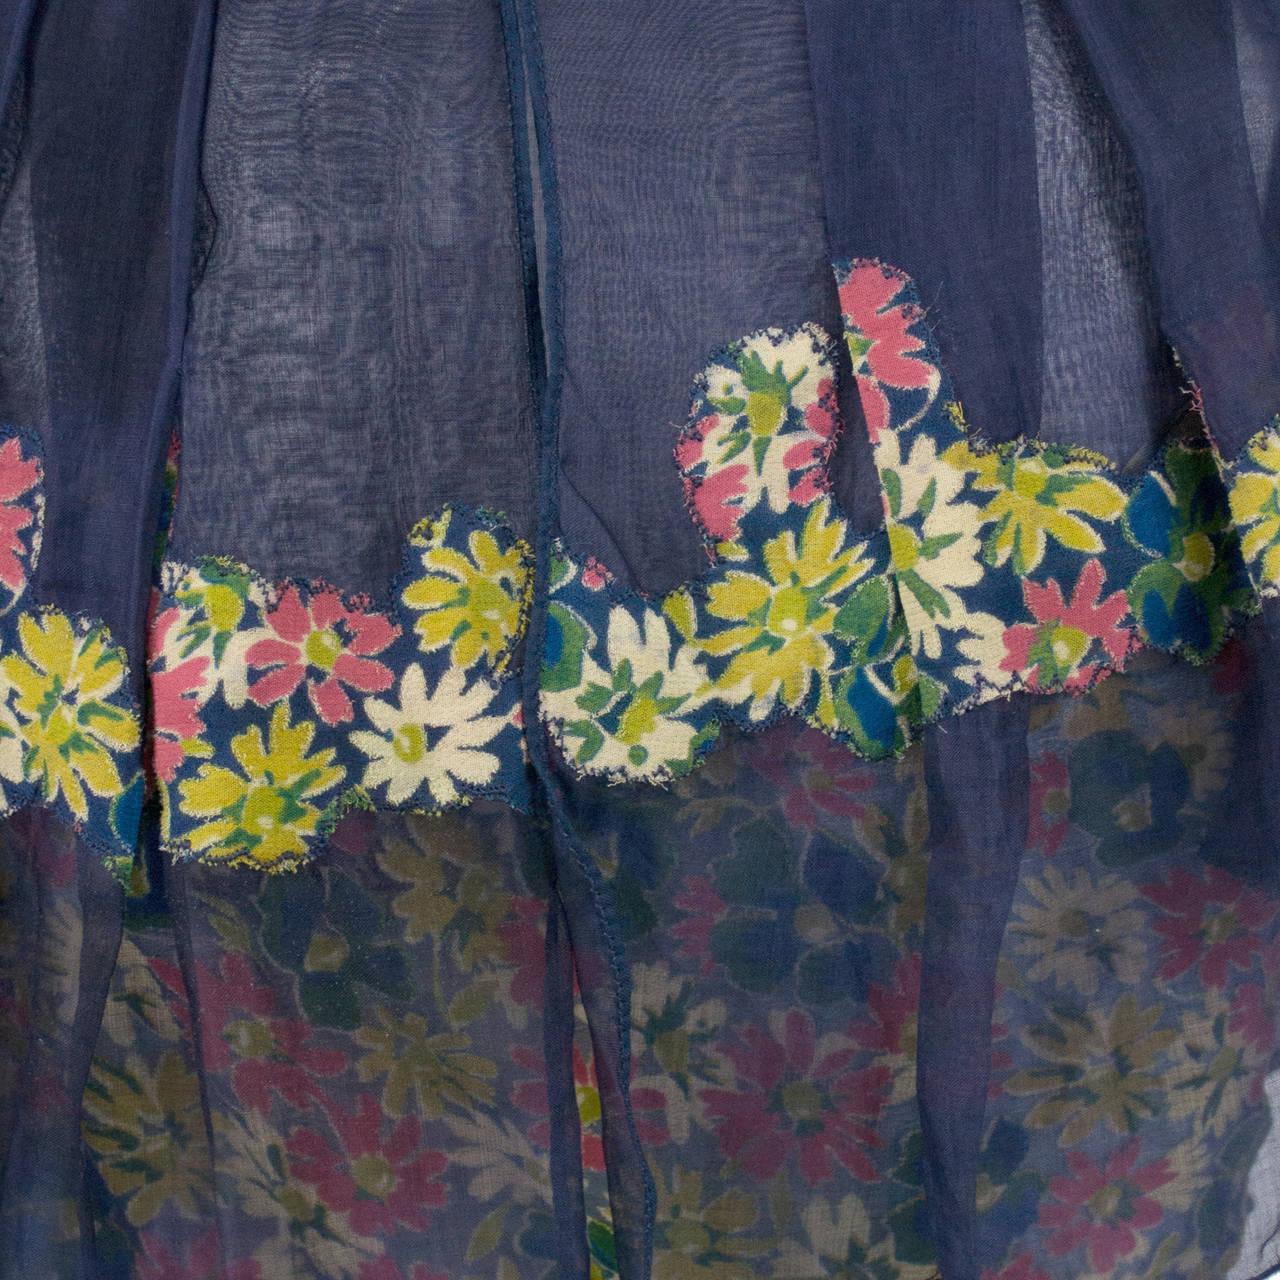 Rare 1930s Vintage Chanel Adaptation Dress Floral Velvet Applique Silk Organza 6